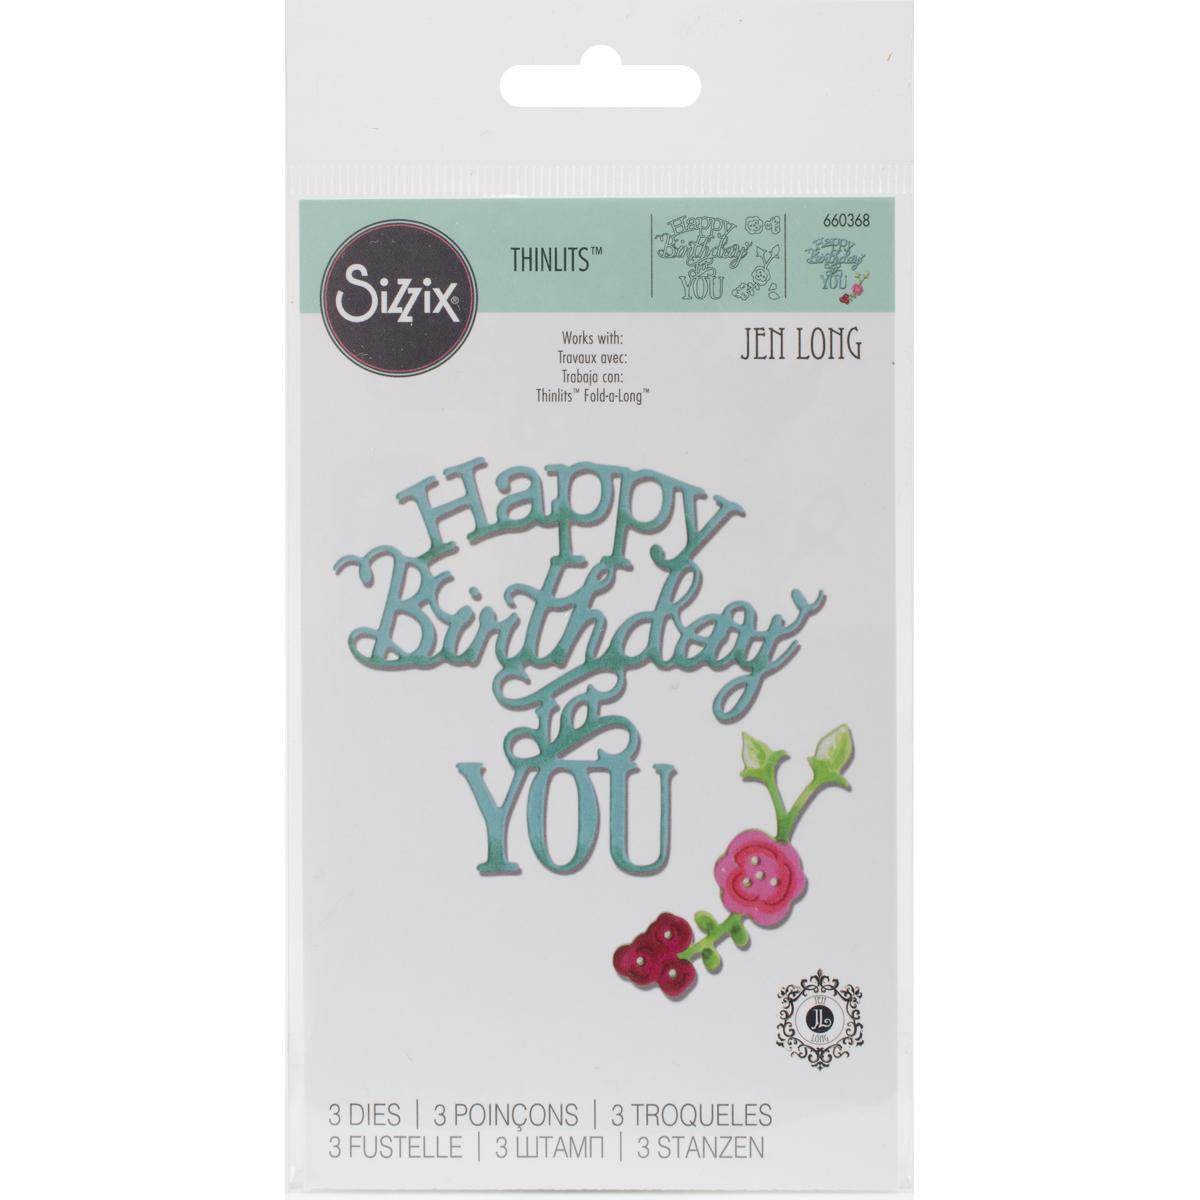 Sizzix Thinlits Phrase Dies - Happy Birthday To You (Jen Long)